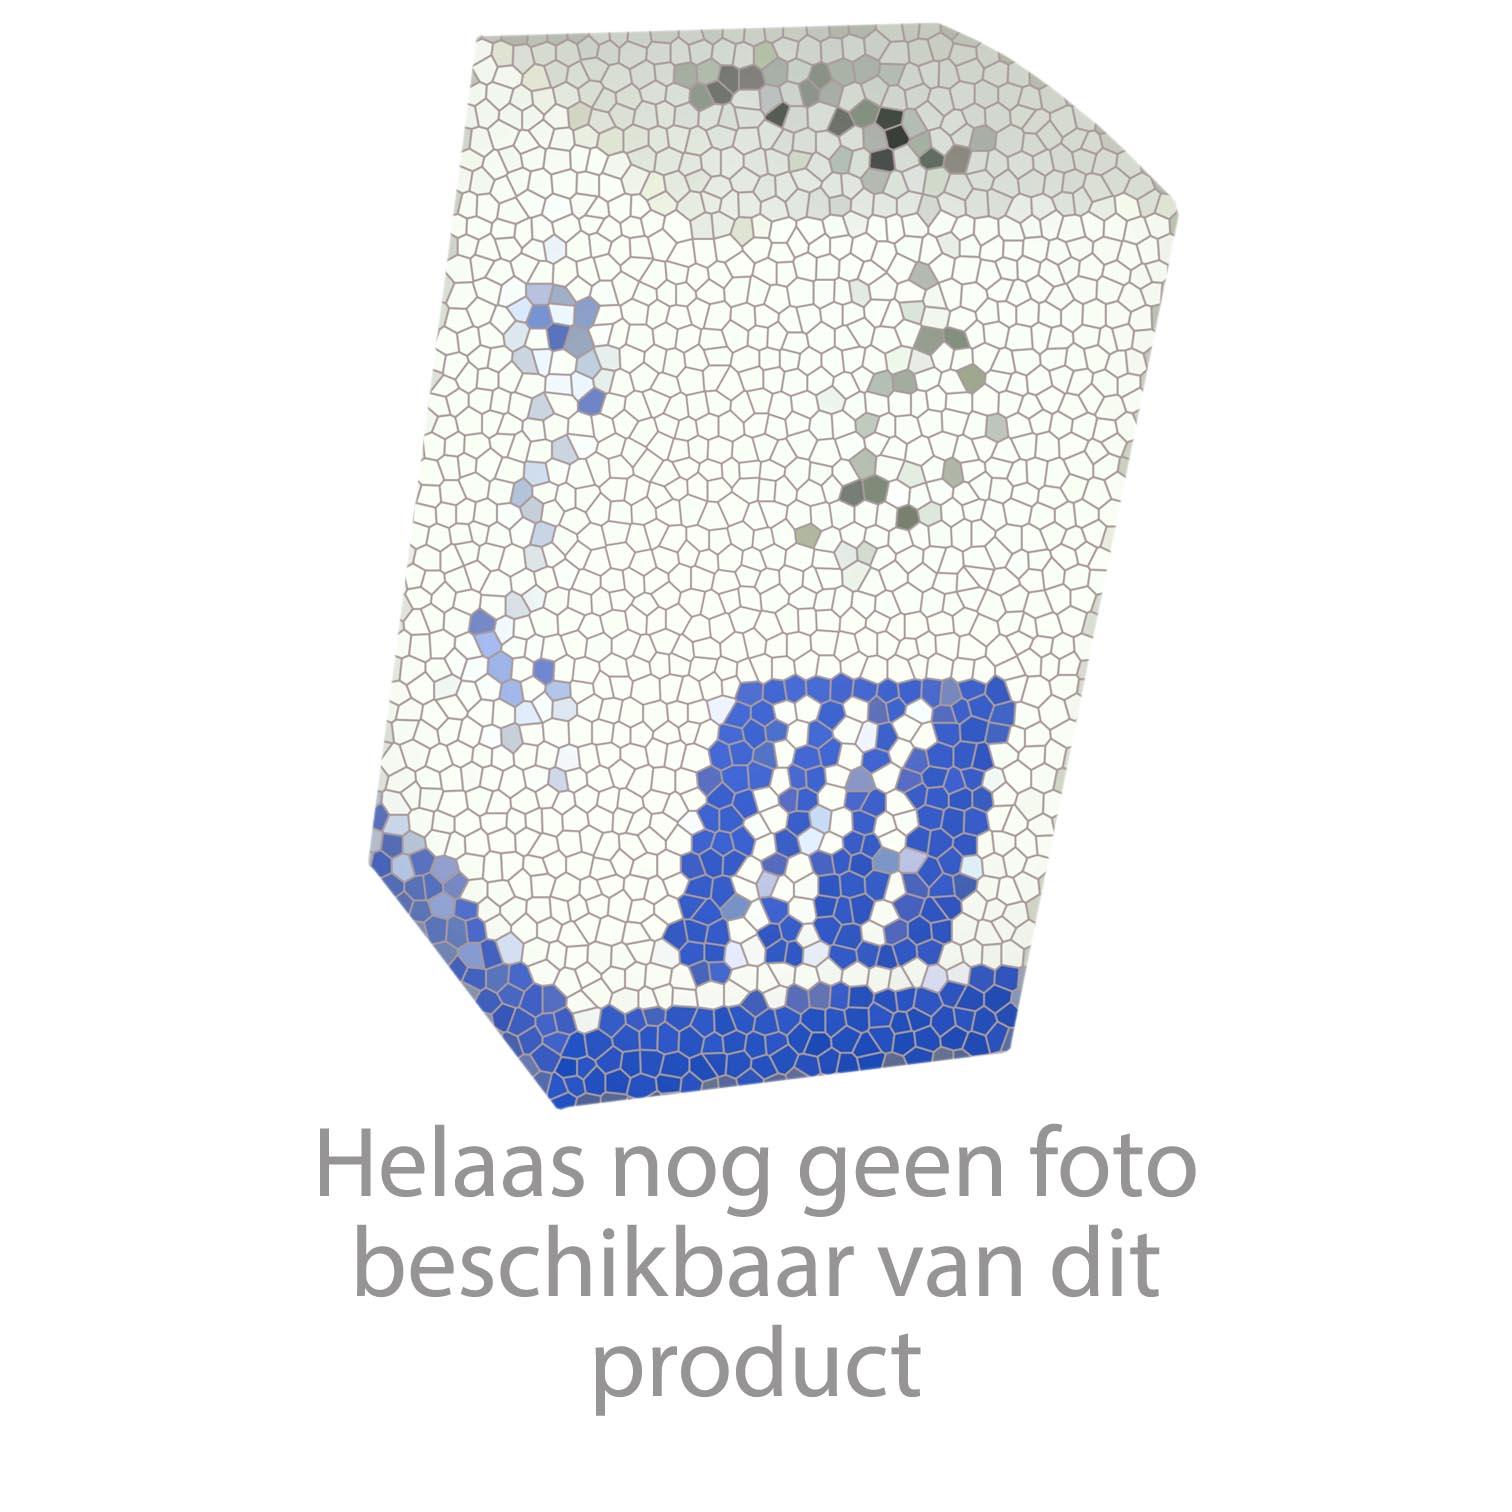 Grohe onderdelen Essence Wastafelmengkraan M/Ketting 28 Mm 32899000